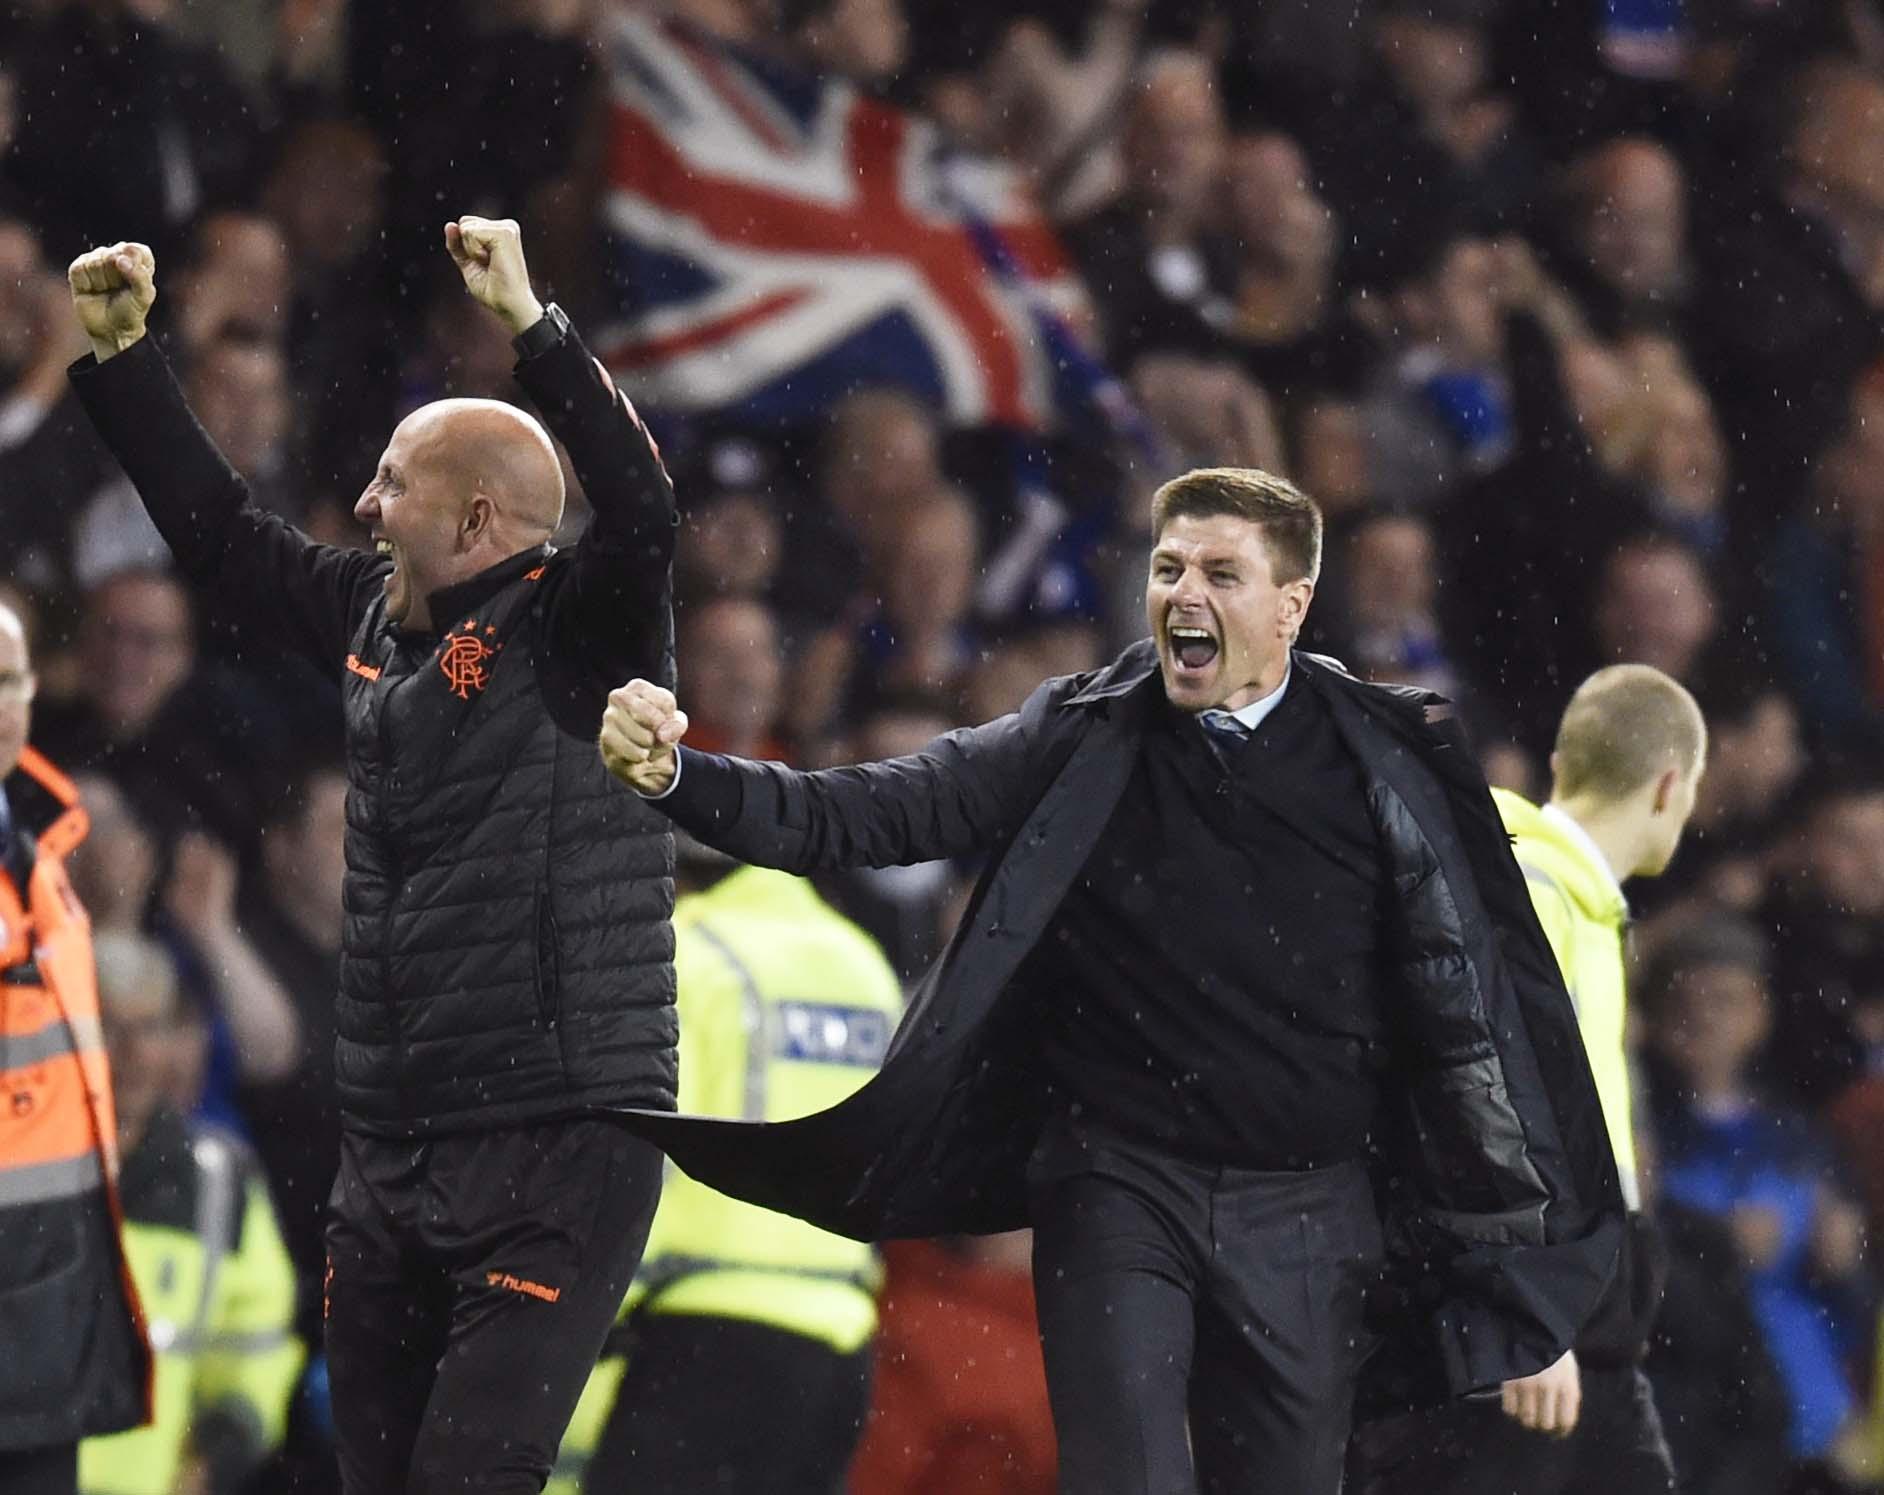 Rangers 1-0 Feyenoord LIVE: Ojo opens the scoring with thunderous strike